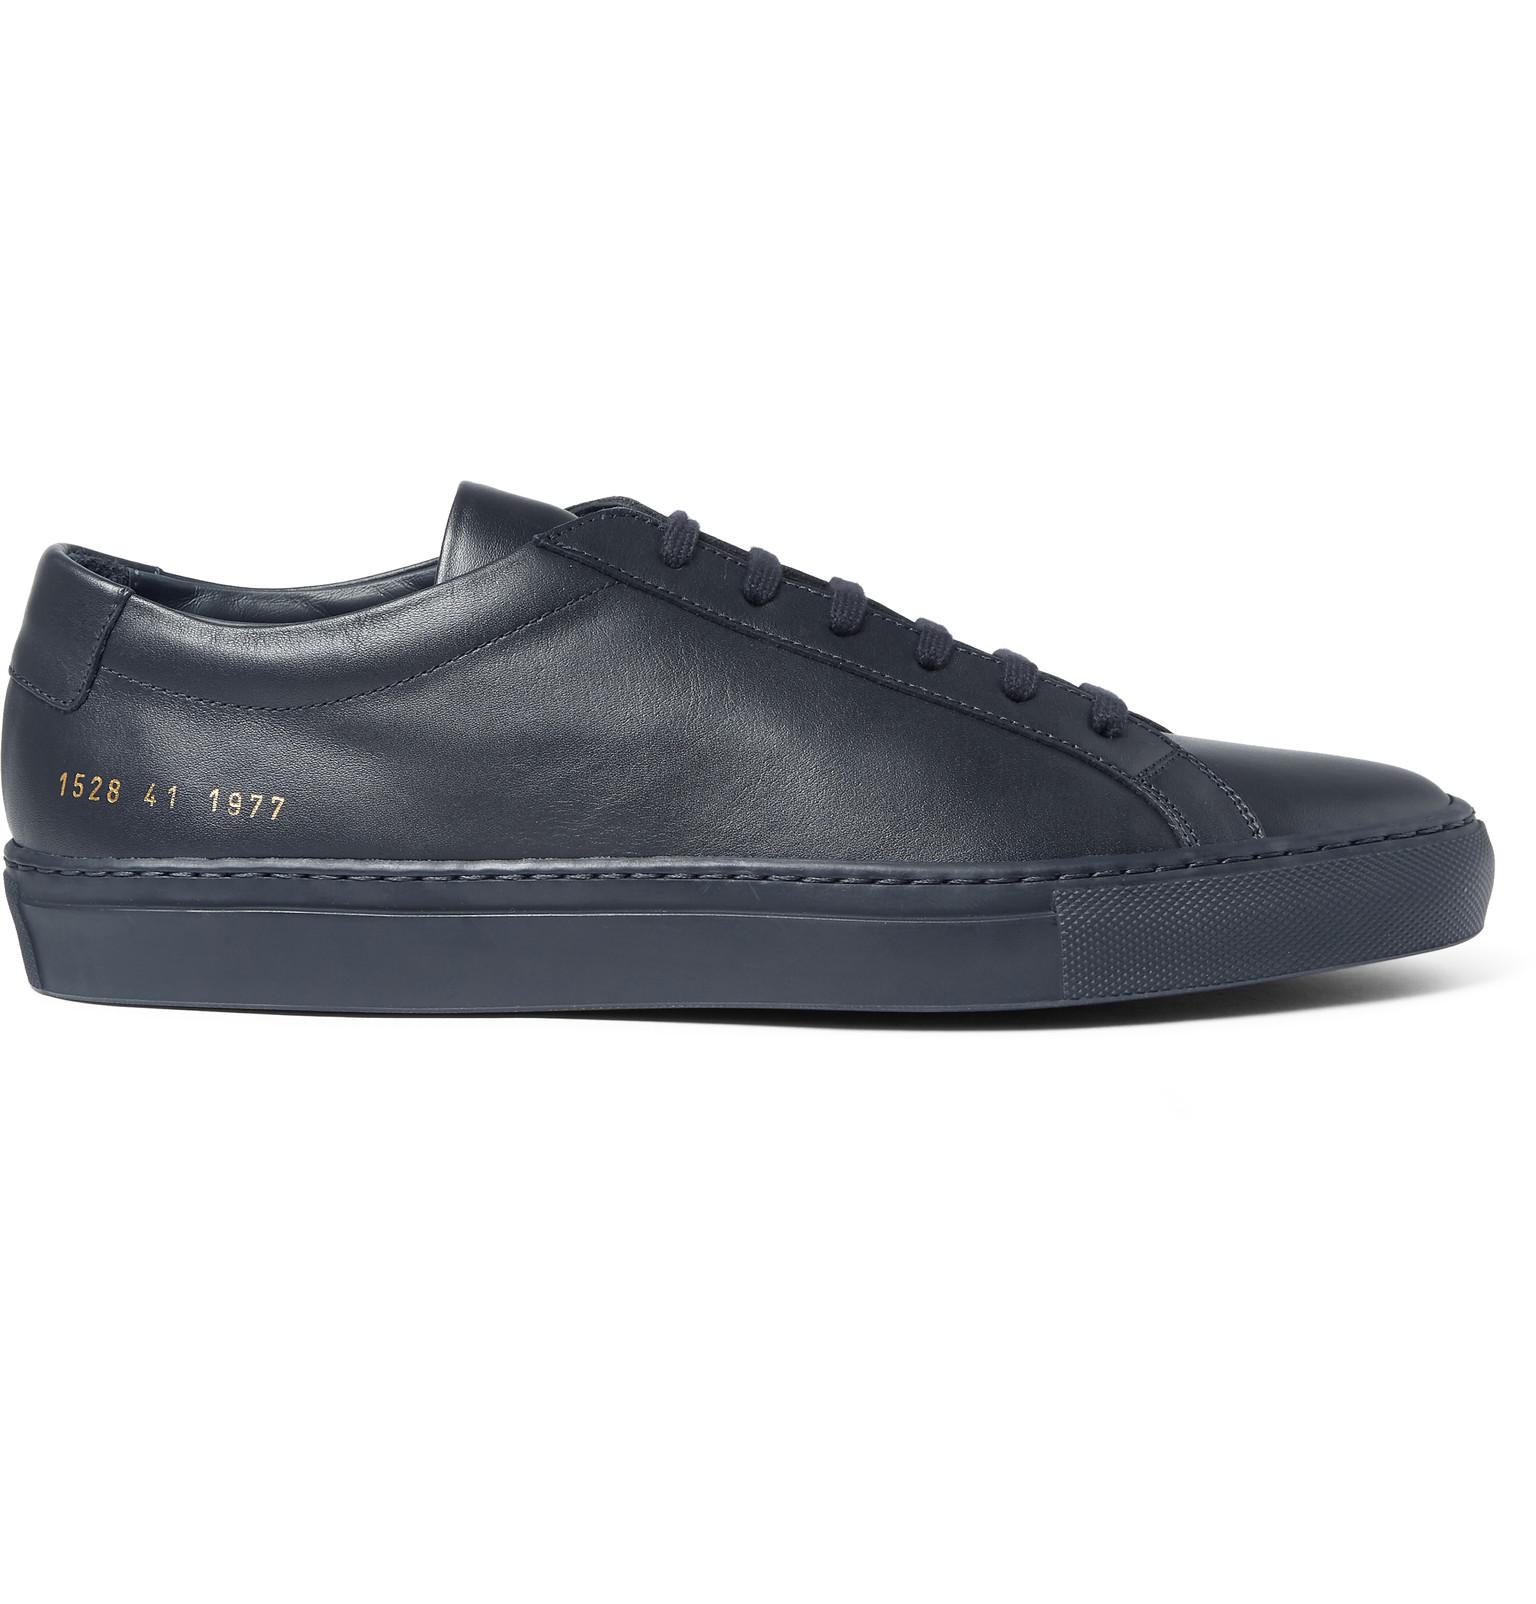 superior quality 2df3c 00ce0 Common ProjectsOriginal Achilles Leather Sneakers